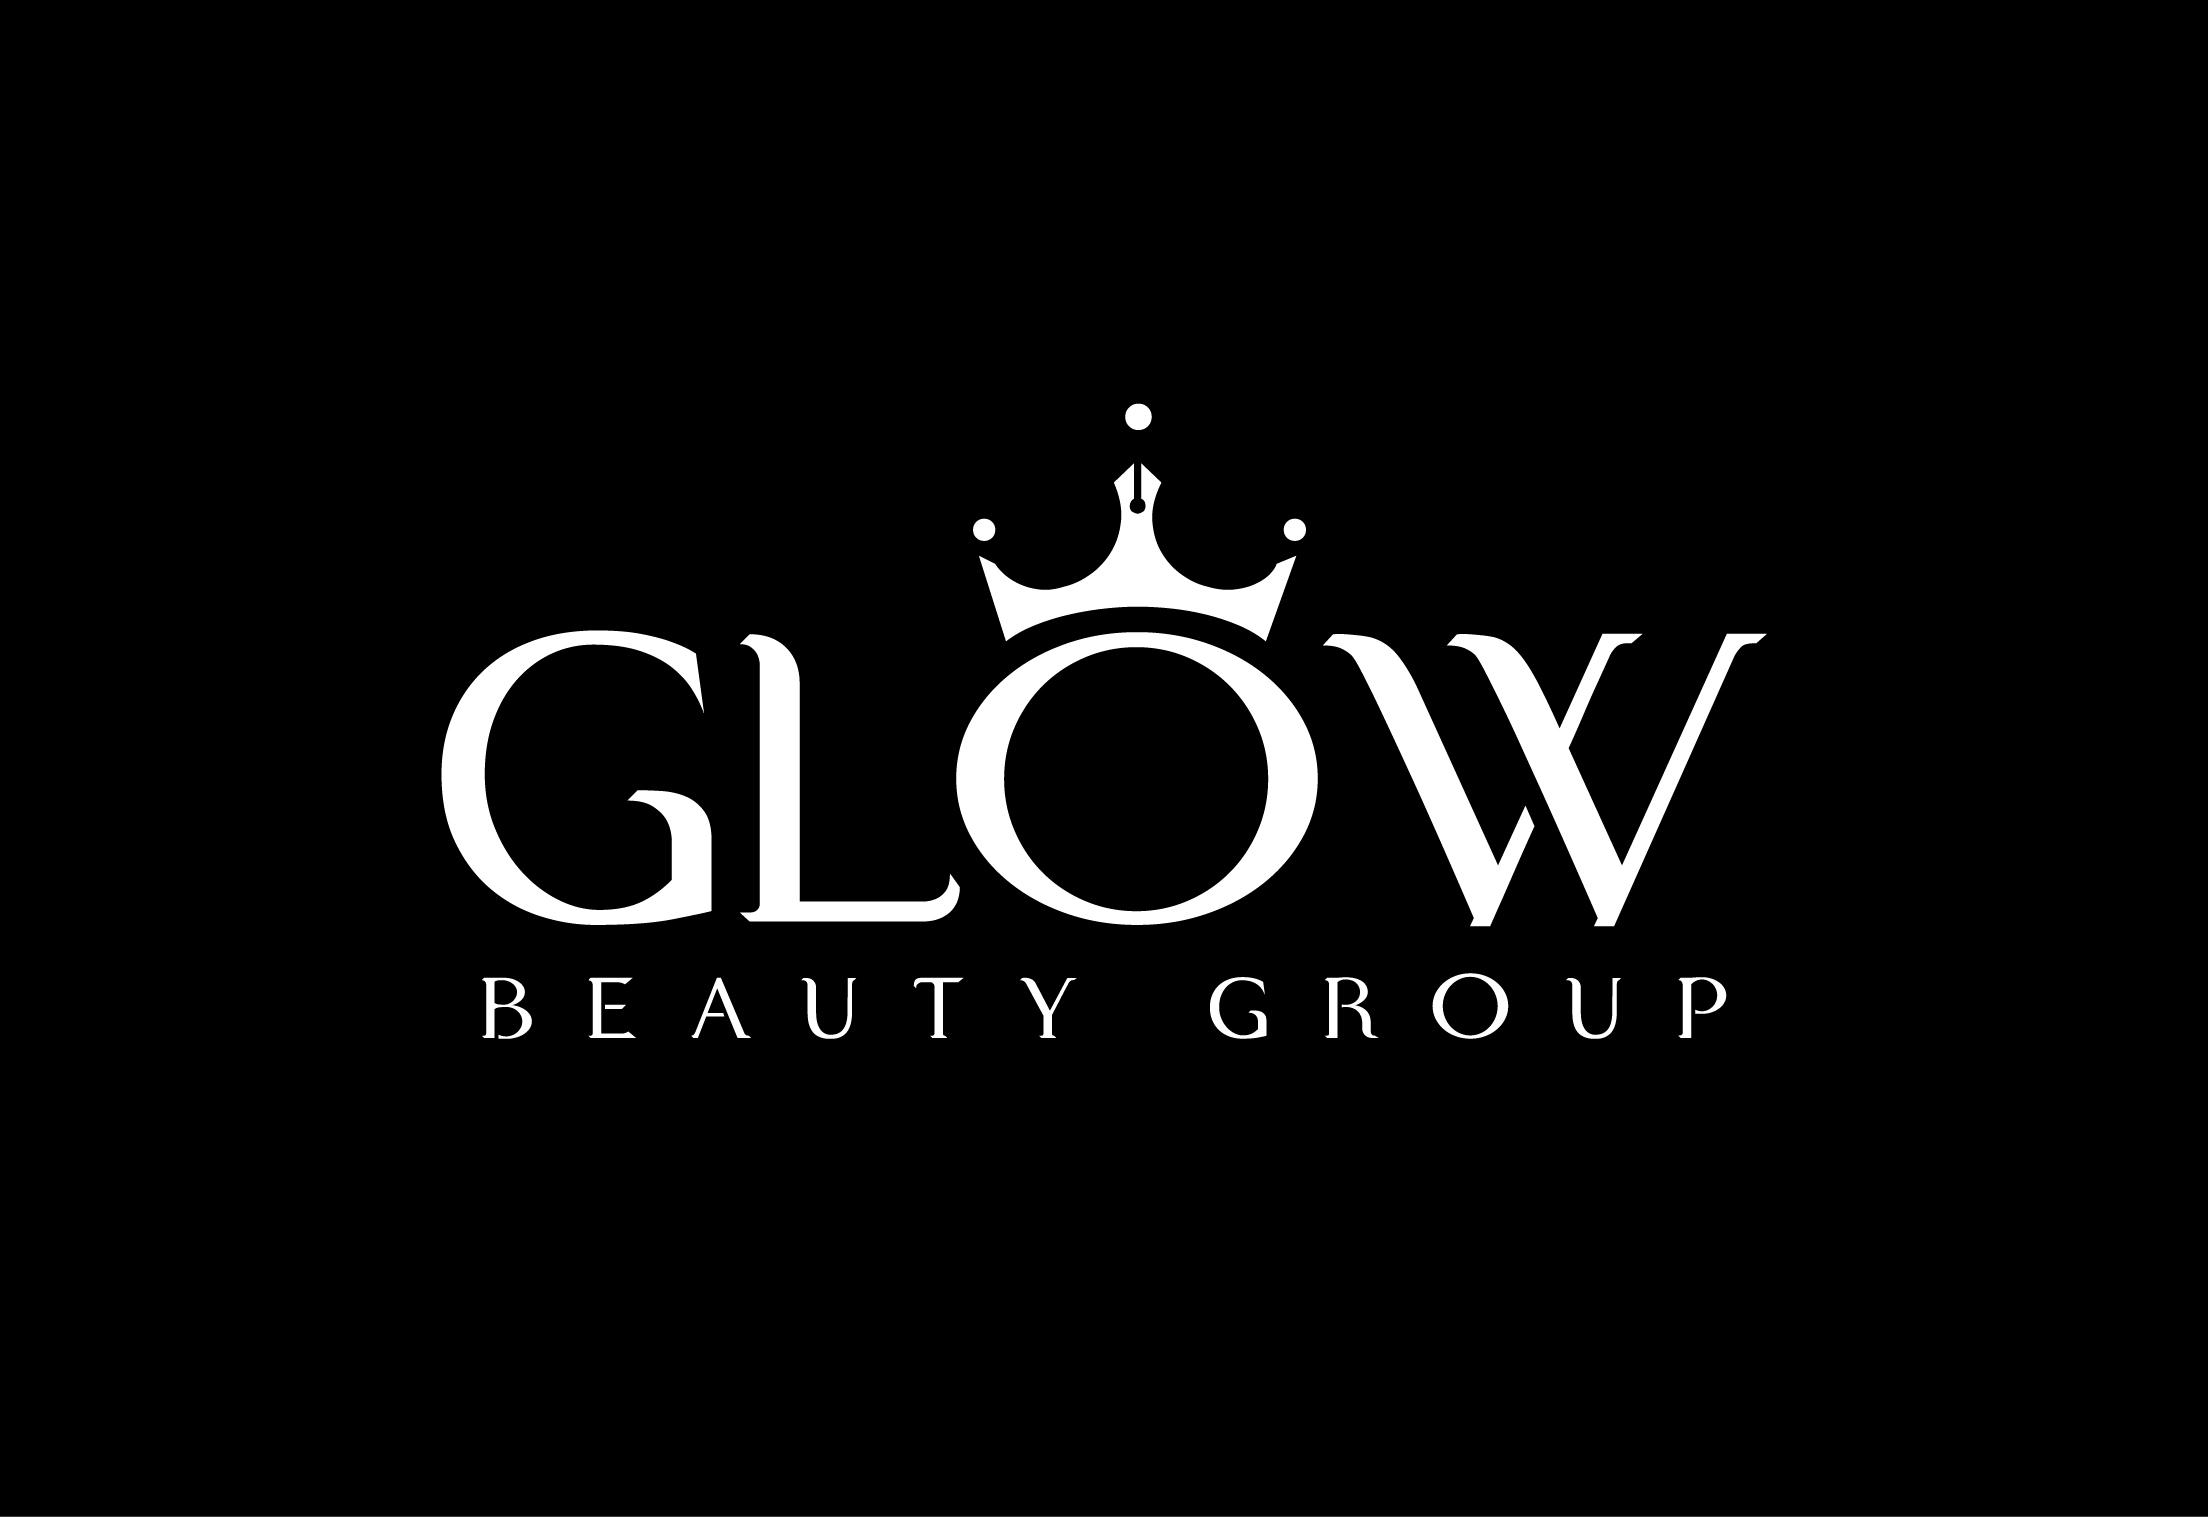 GLOW Beauty Group